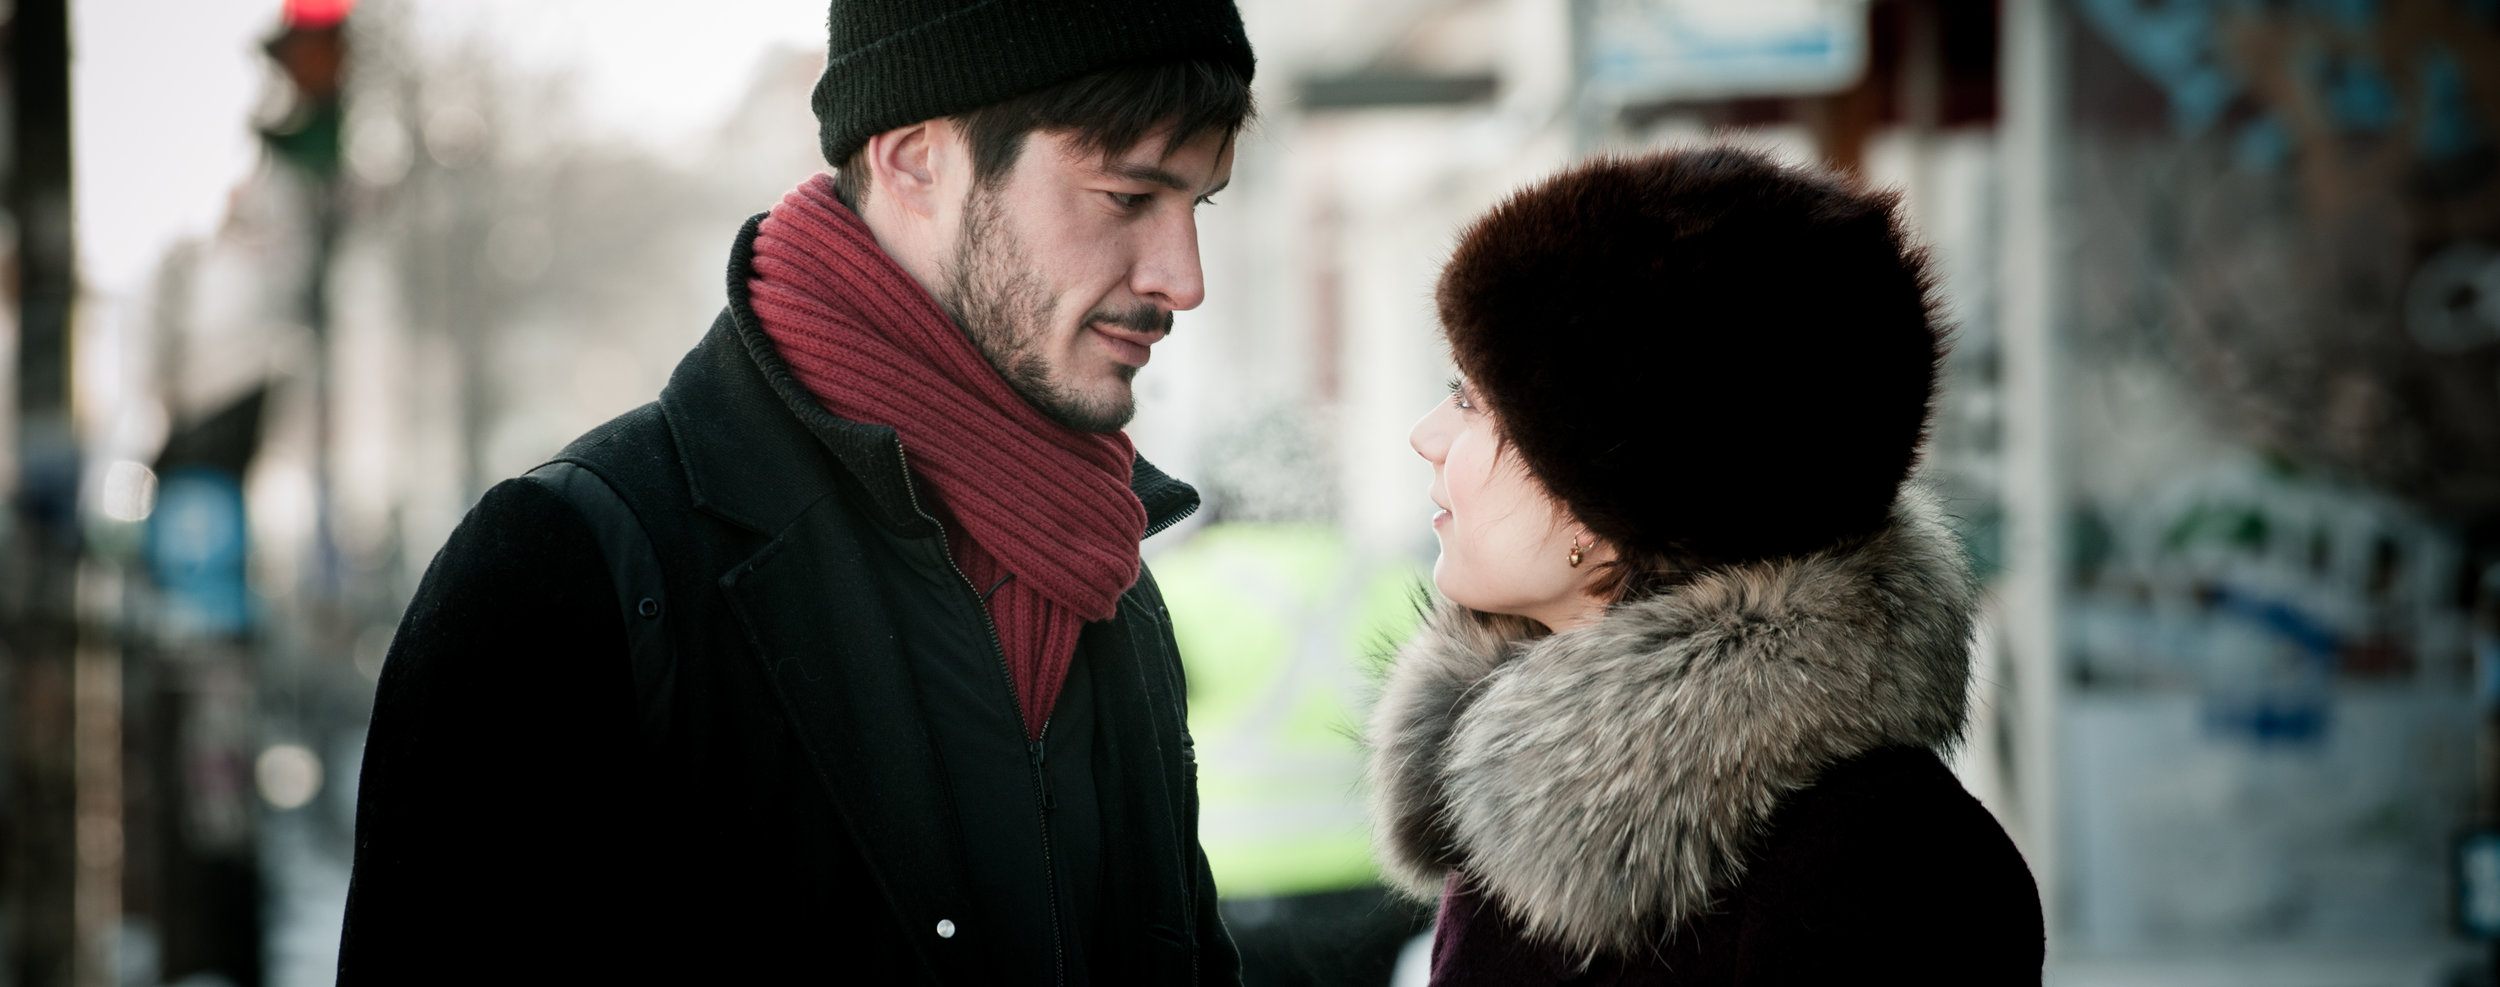 Gurov et Anna-67.jpg